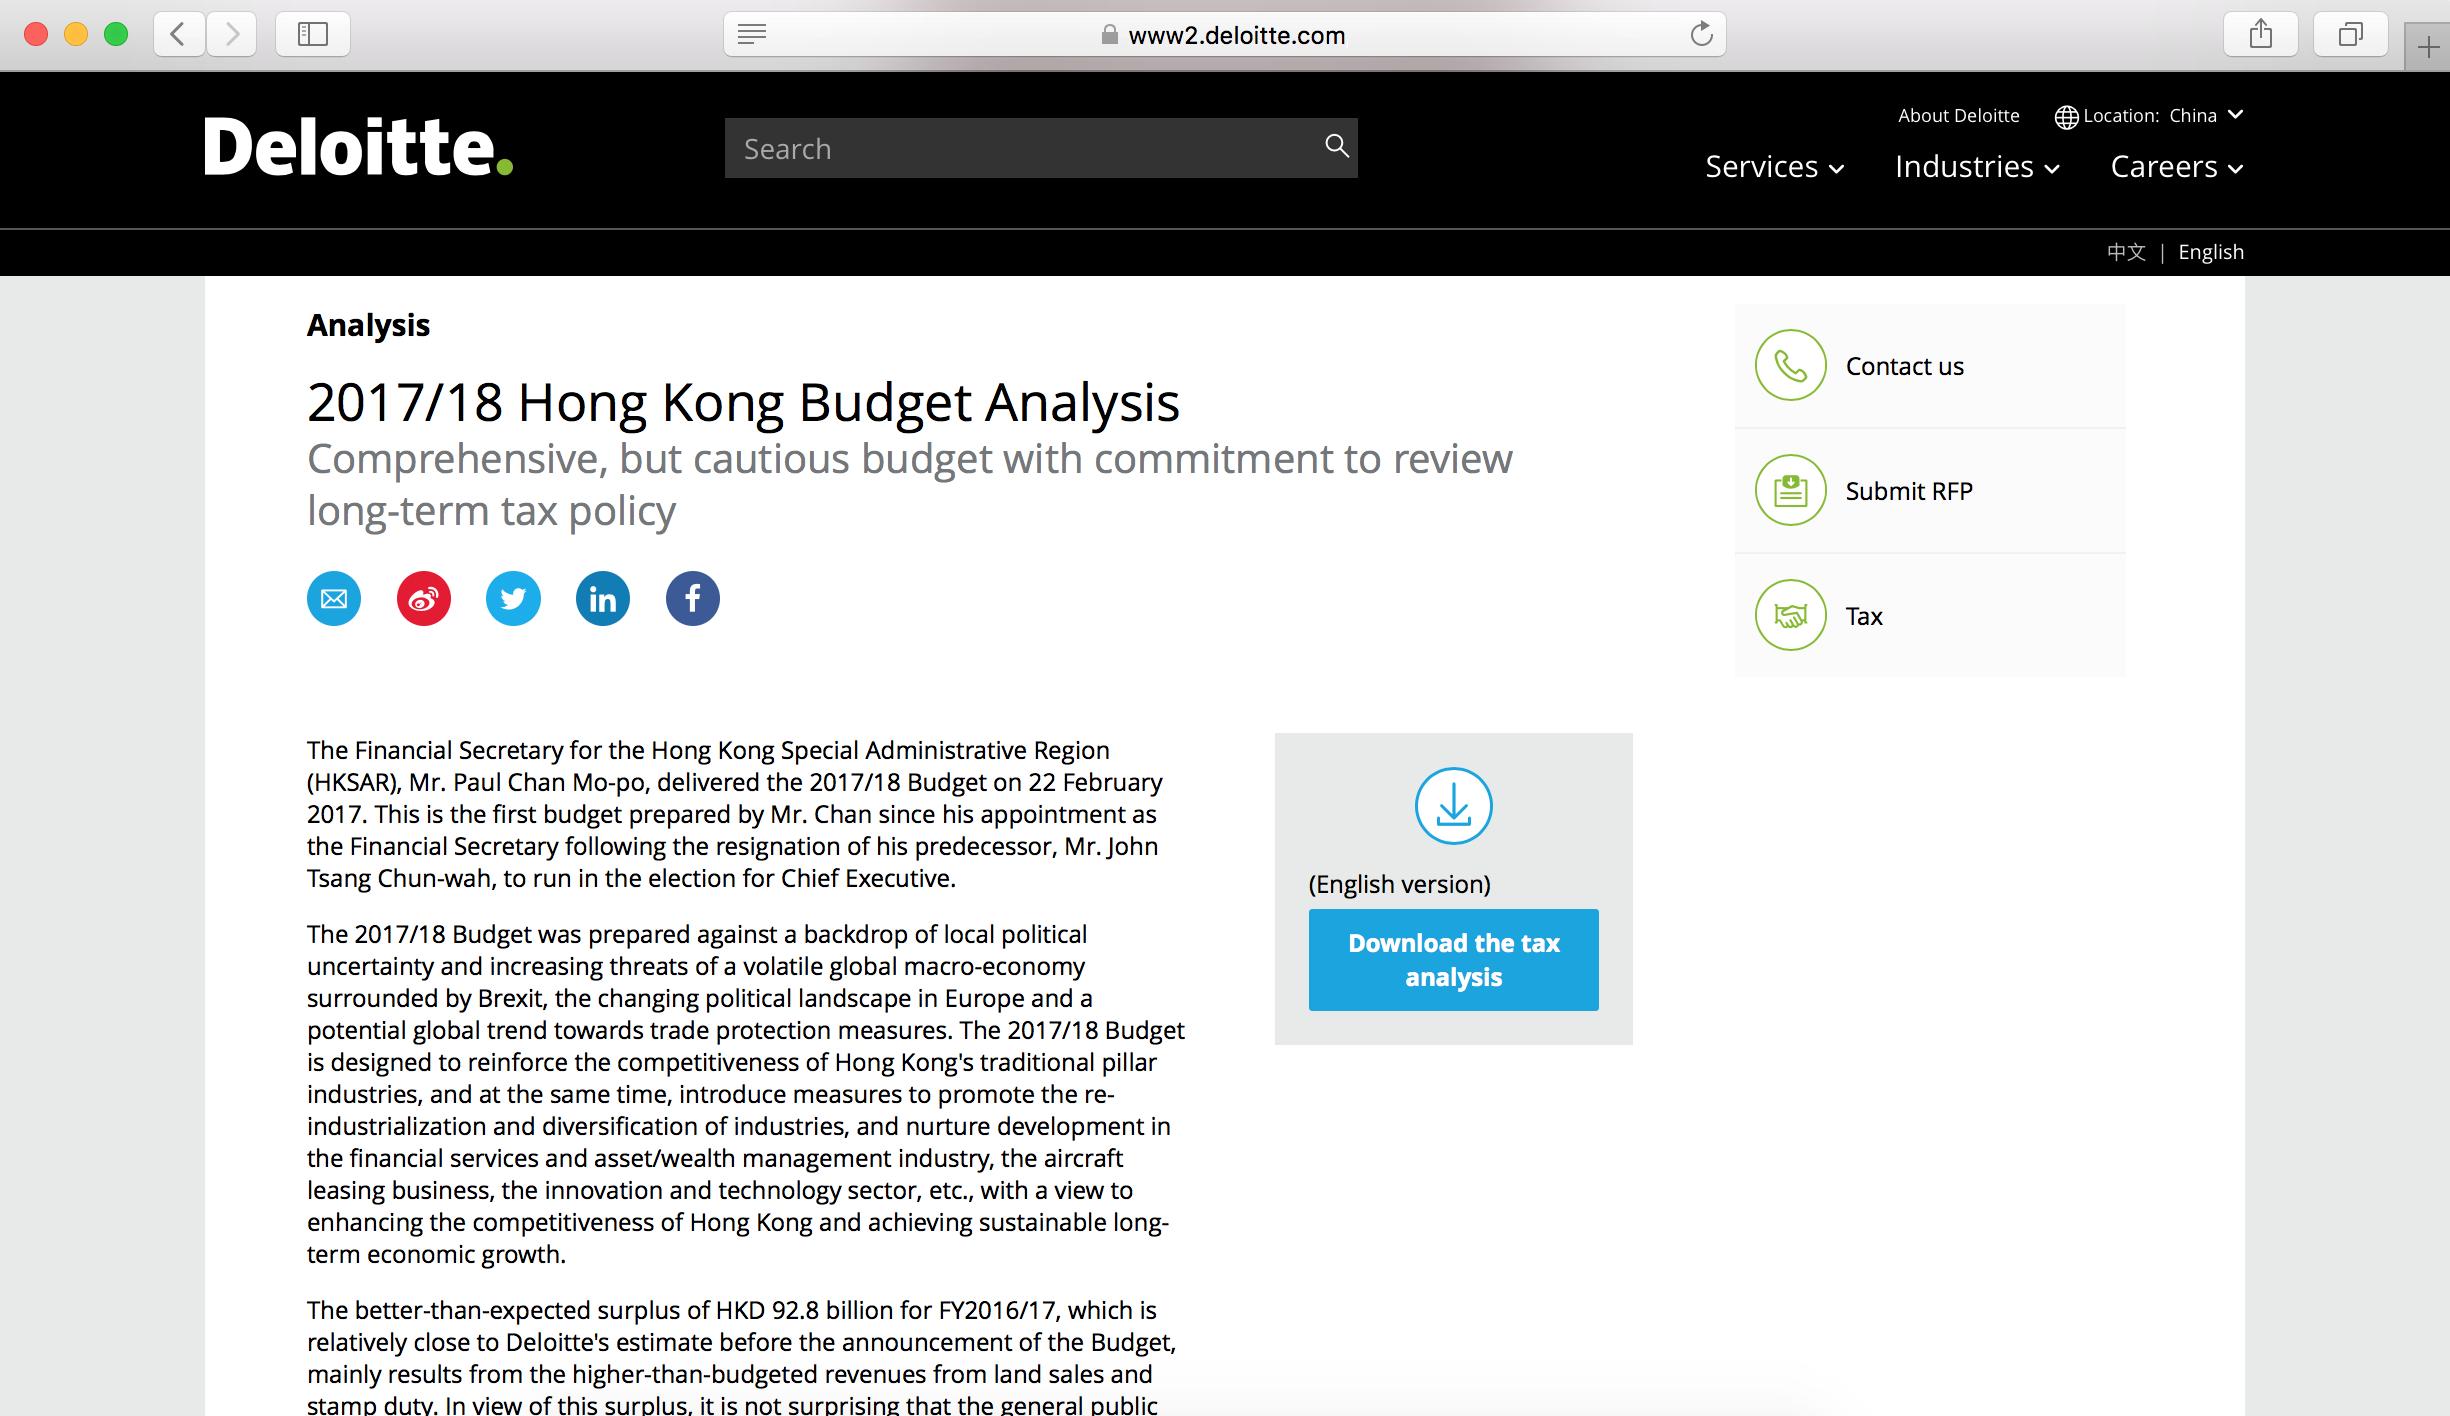 deloitte hk budget analysis